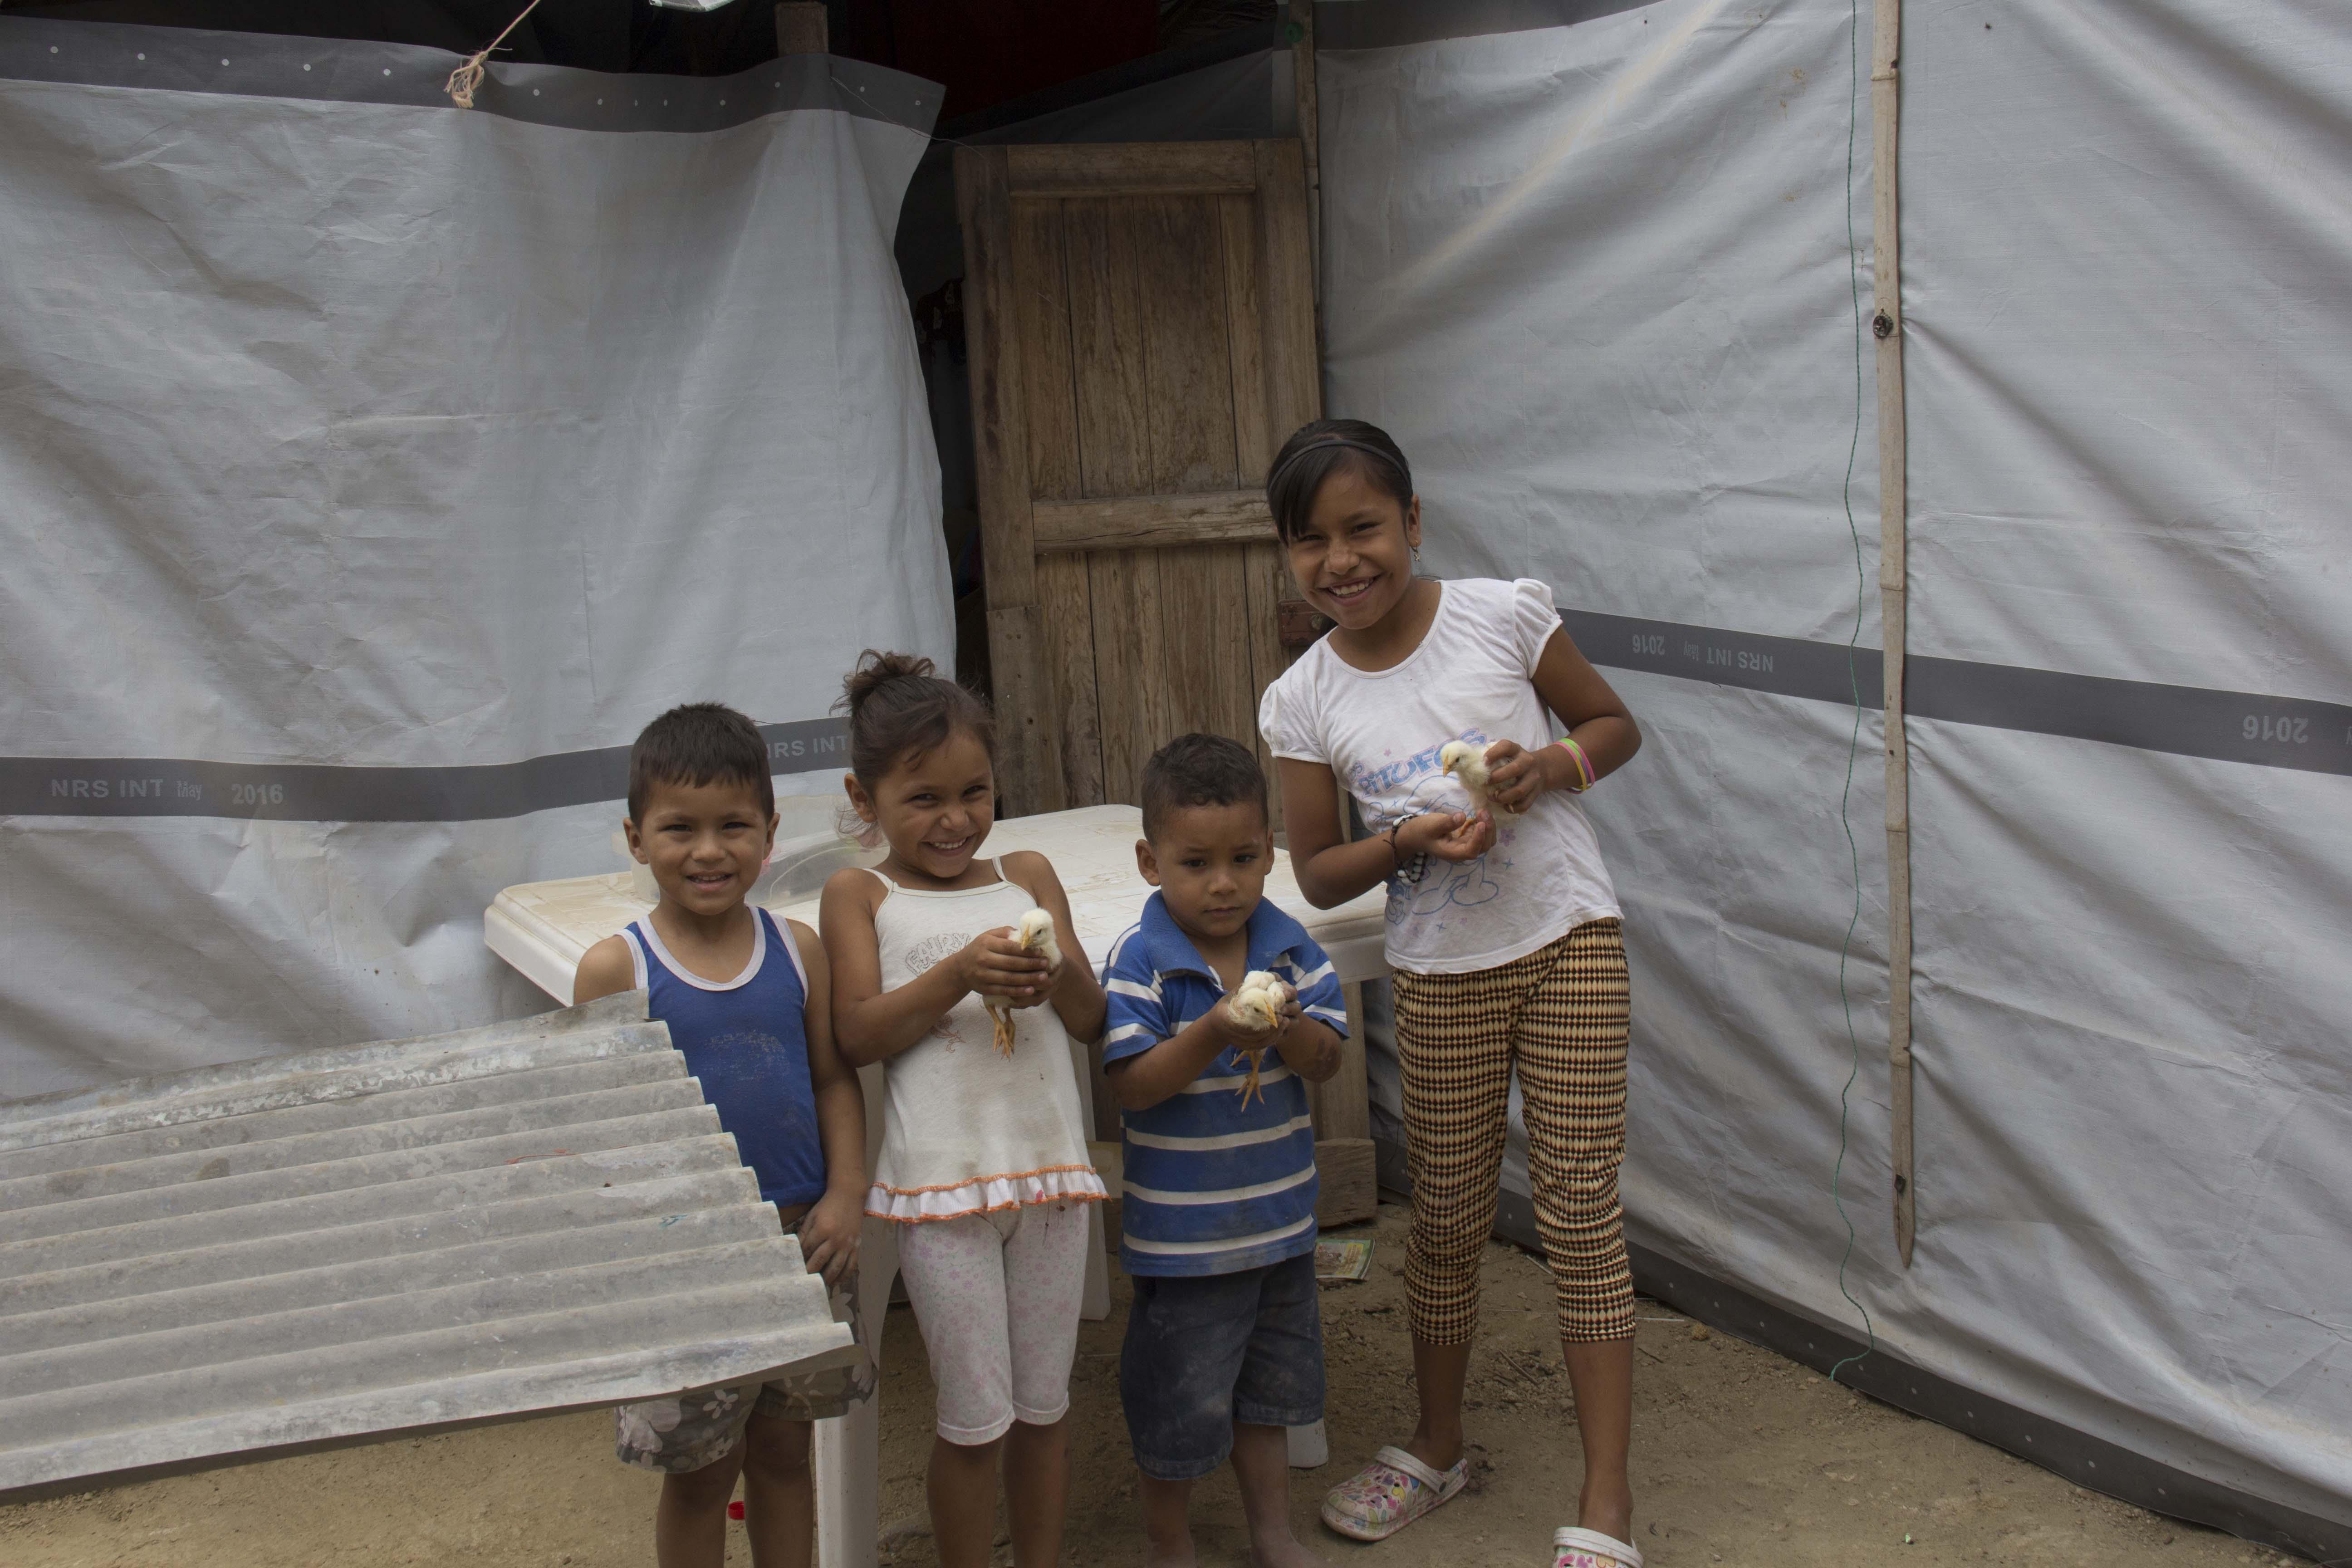 refugee kids smiling in front of tarpaulins at Ecuador in 2016